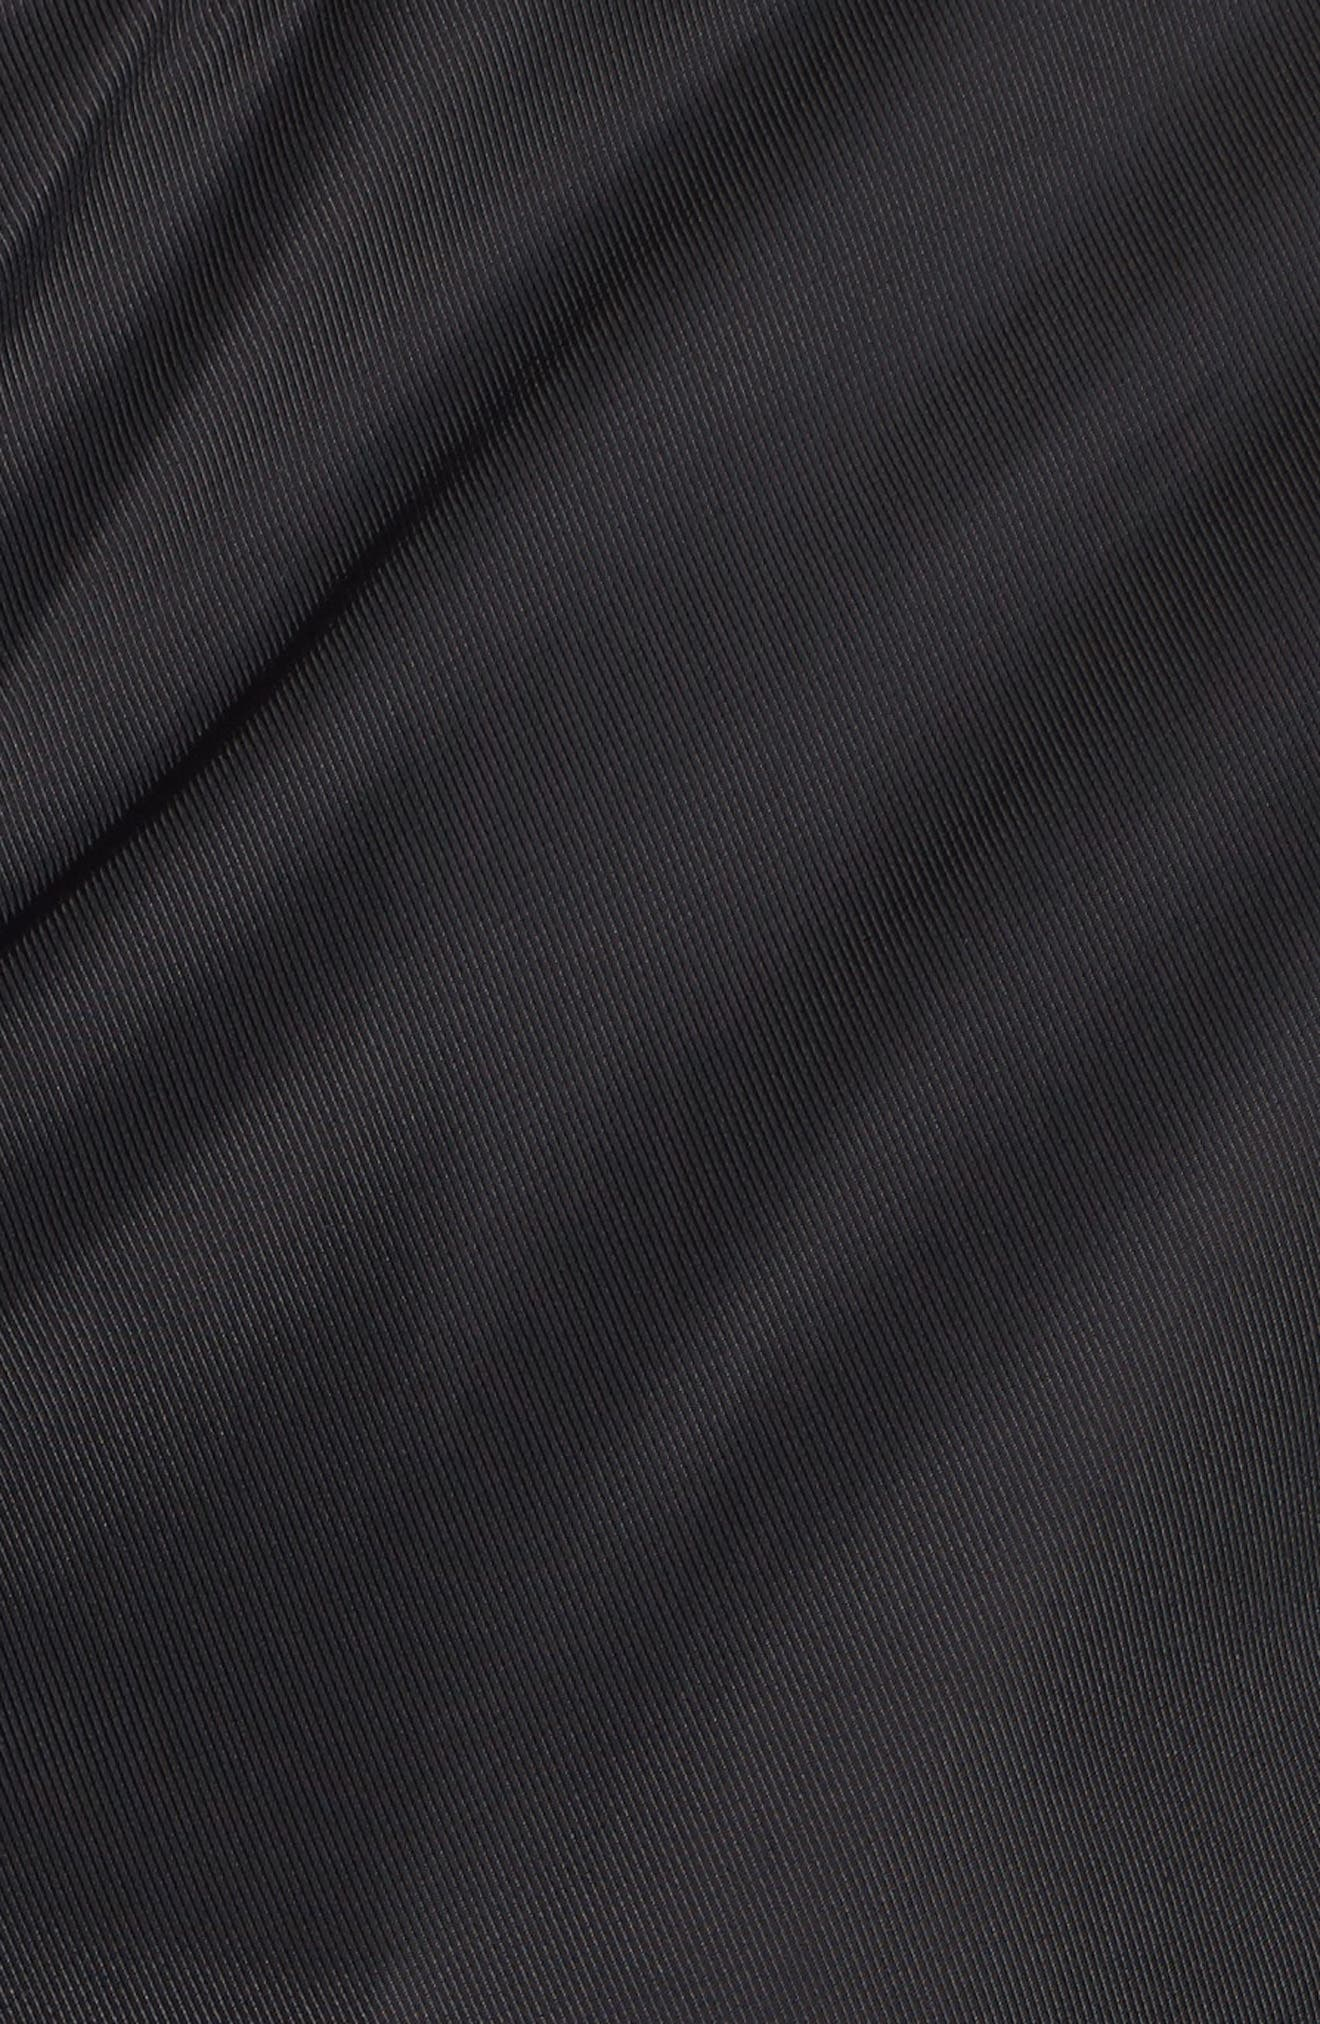 Bomber Anorak Jacket,                             Alternate thumbnail 5, color,                             Black